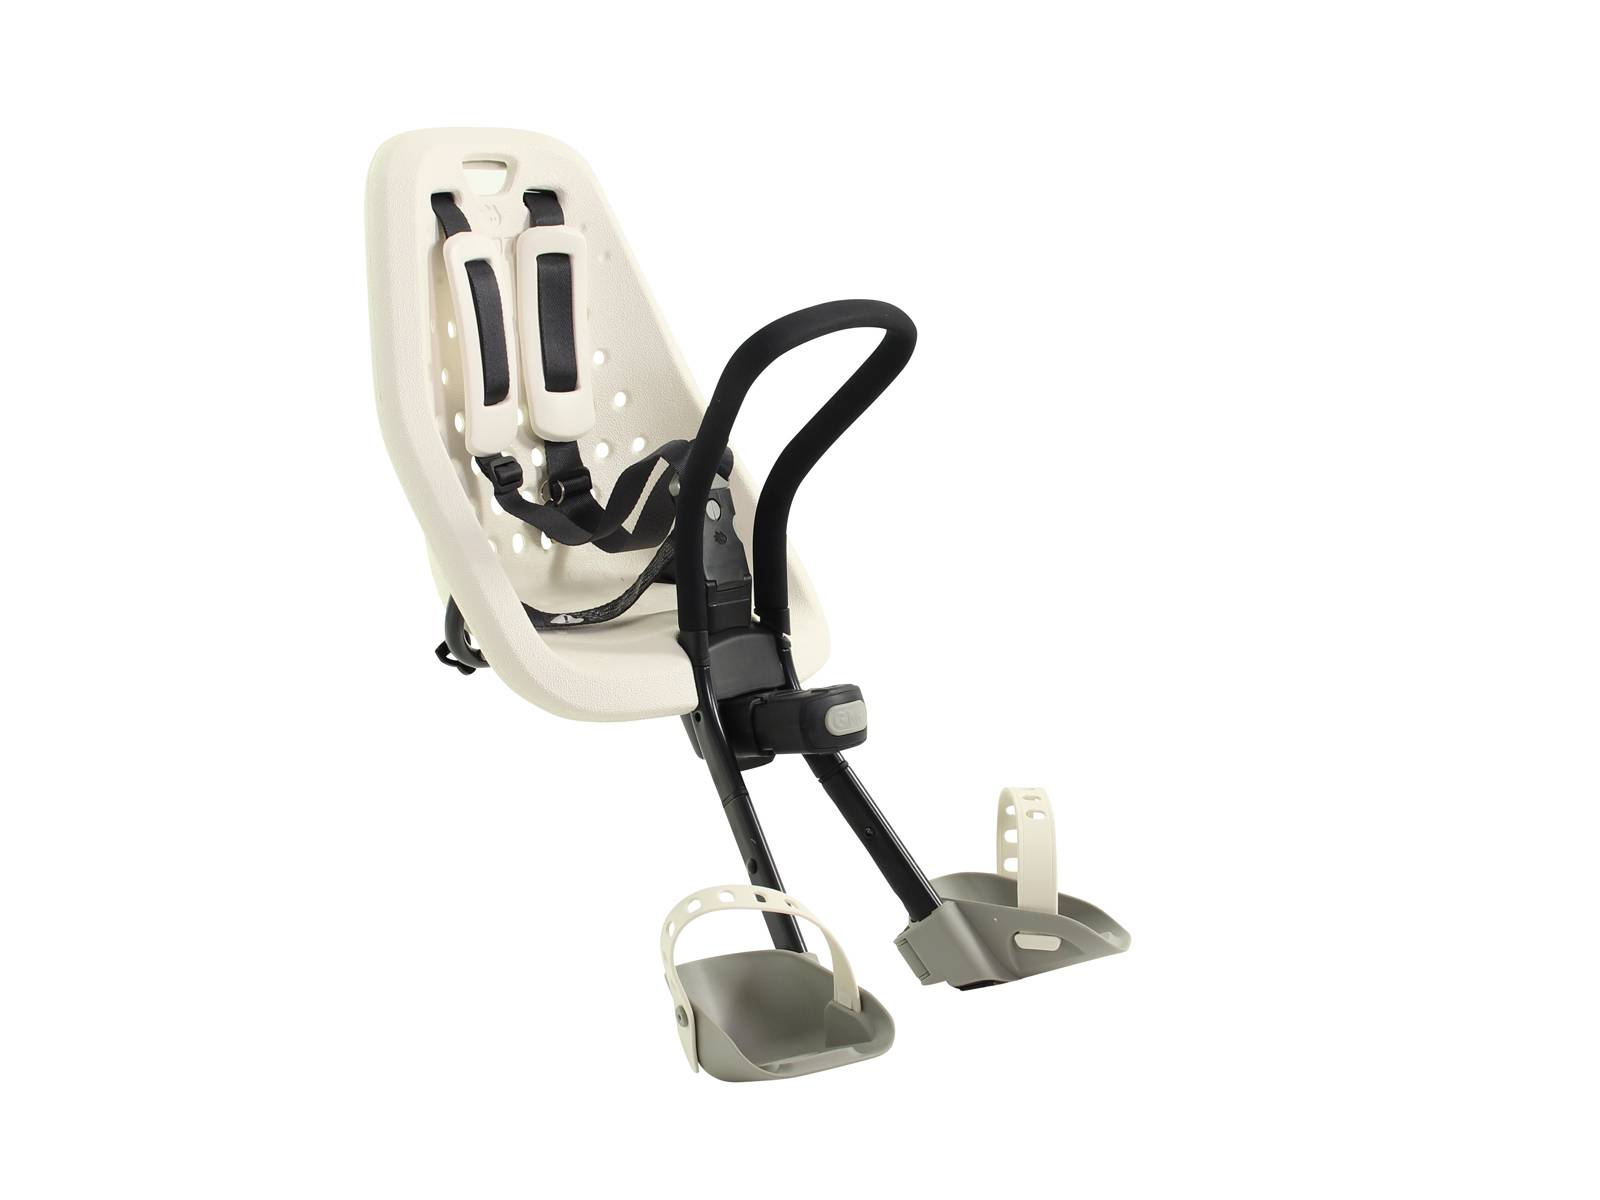 gmg yepp fahrrad kindersitz vorne mini weiss fahrradkomfort. Black Bedroom Furniture Sets. Home Design Ideas